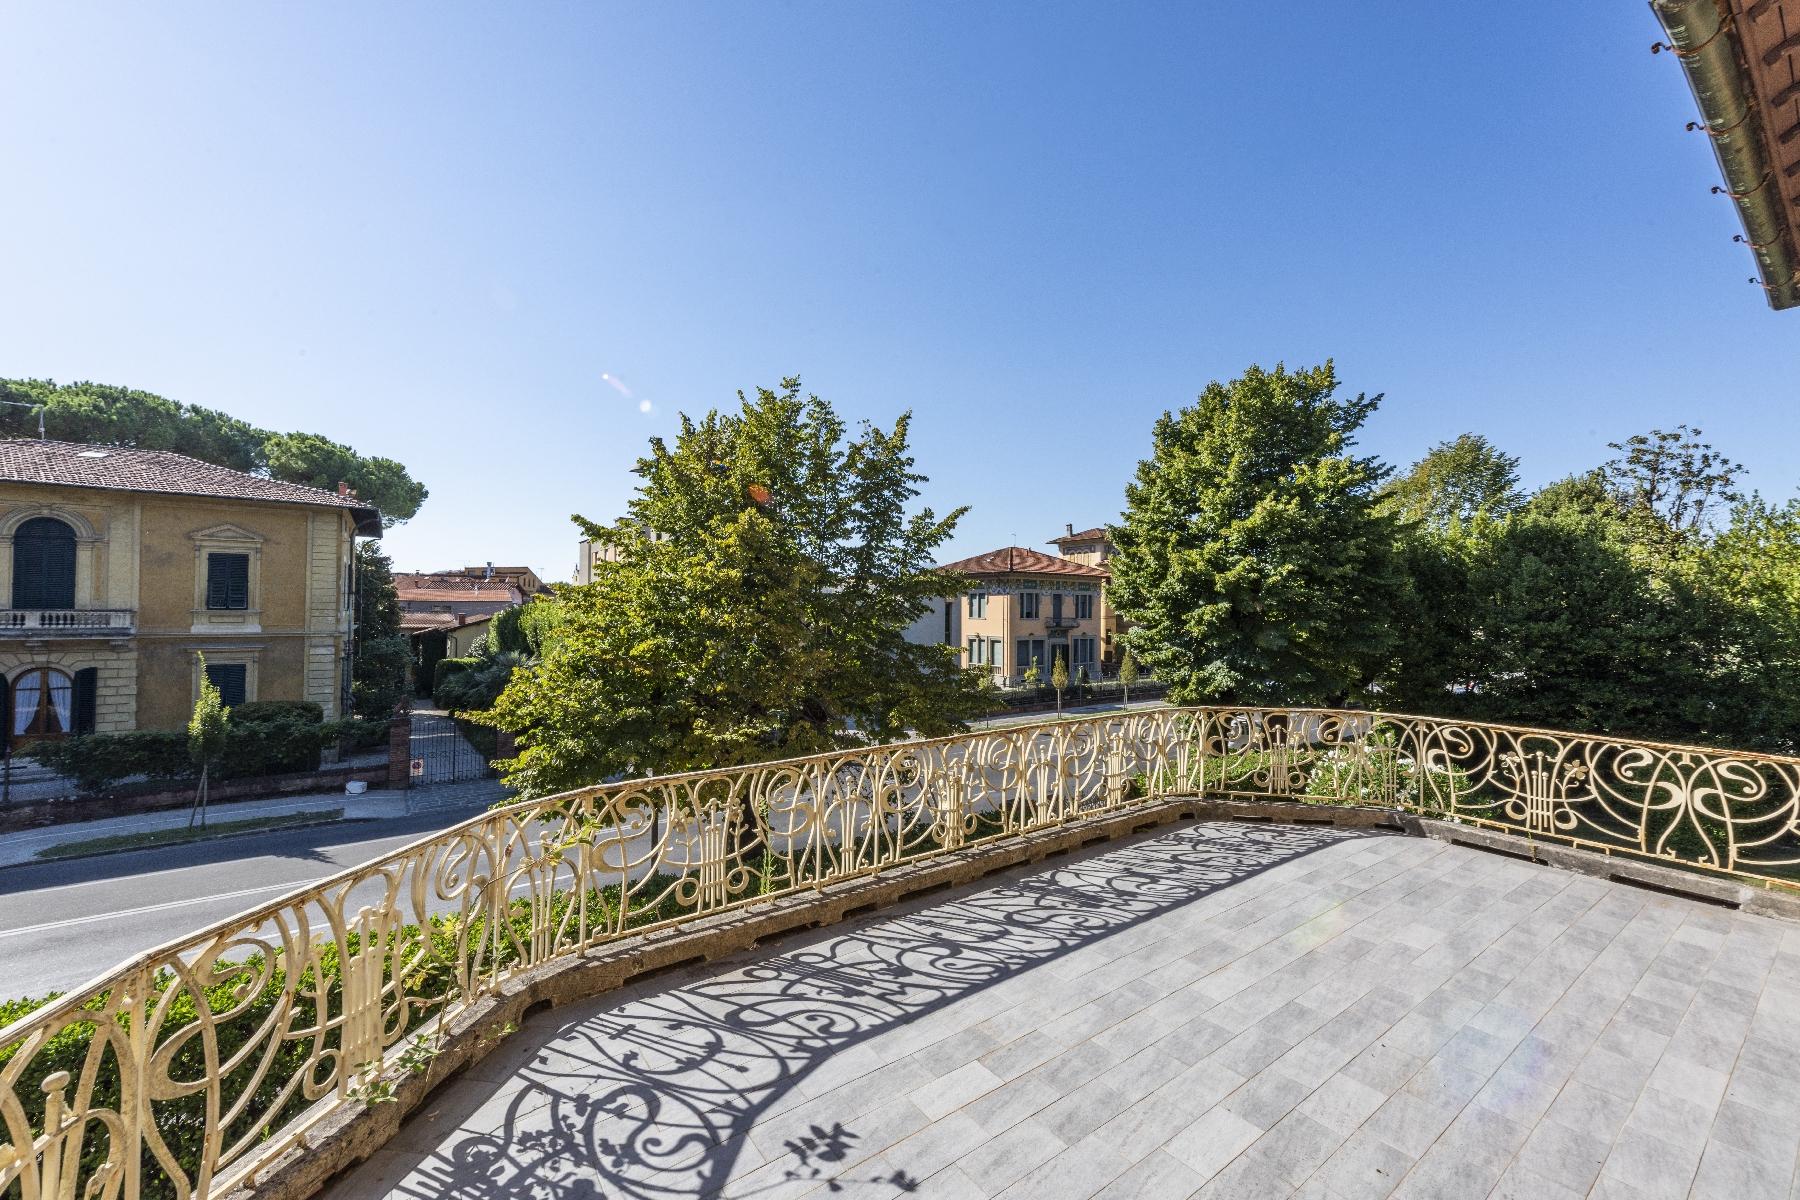 Villa in Vendita a Lucca: 5 locali, 660 mq - Foto 17